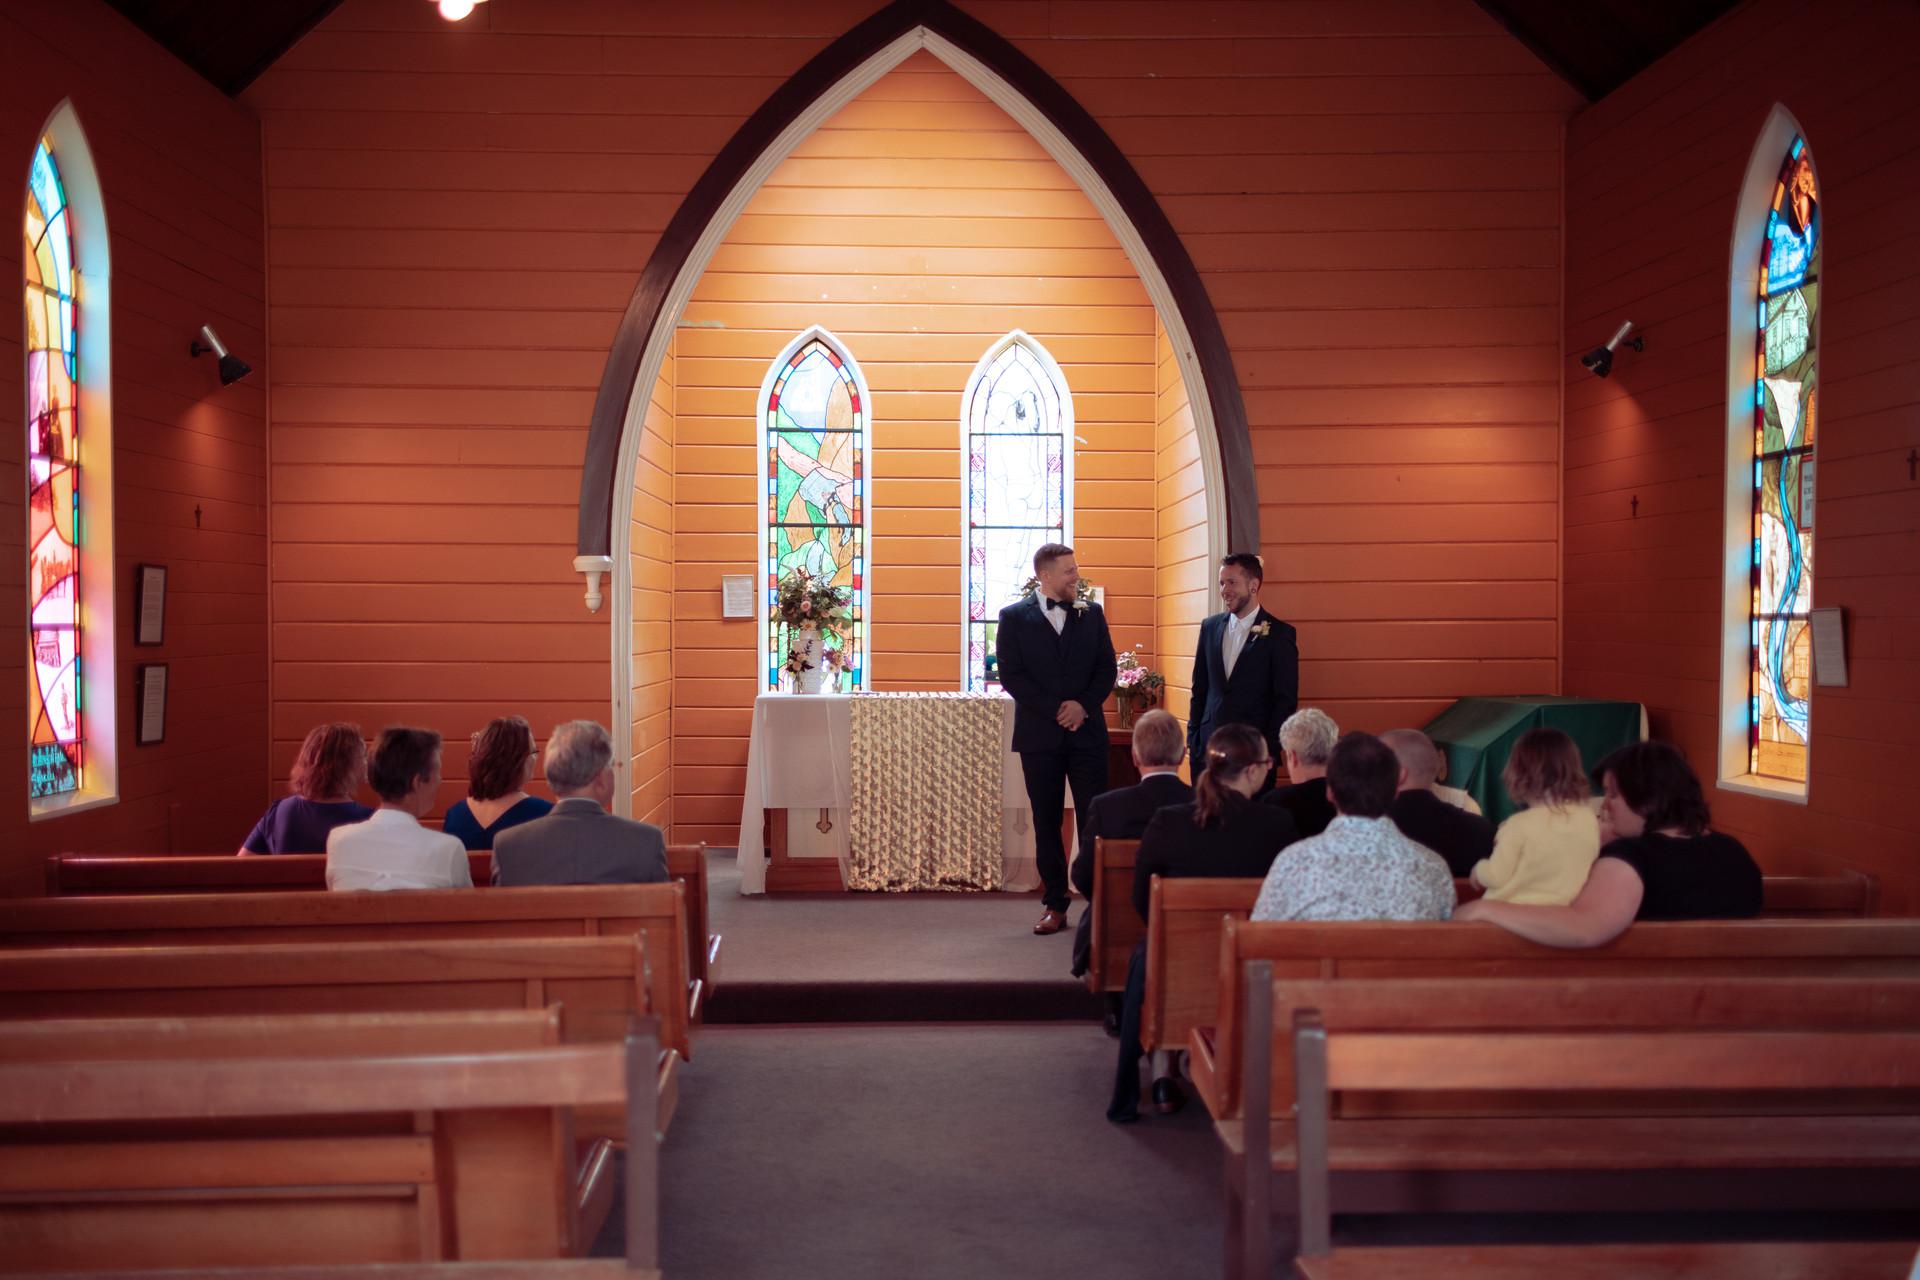 Chris & Loran Wedding - St Patrick's Chu